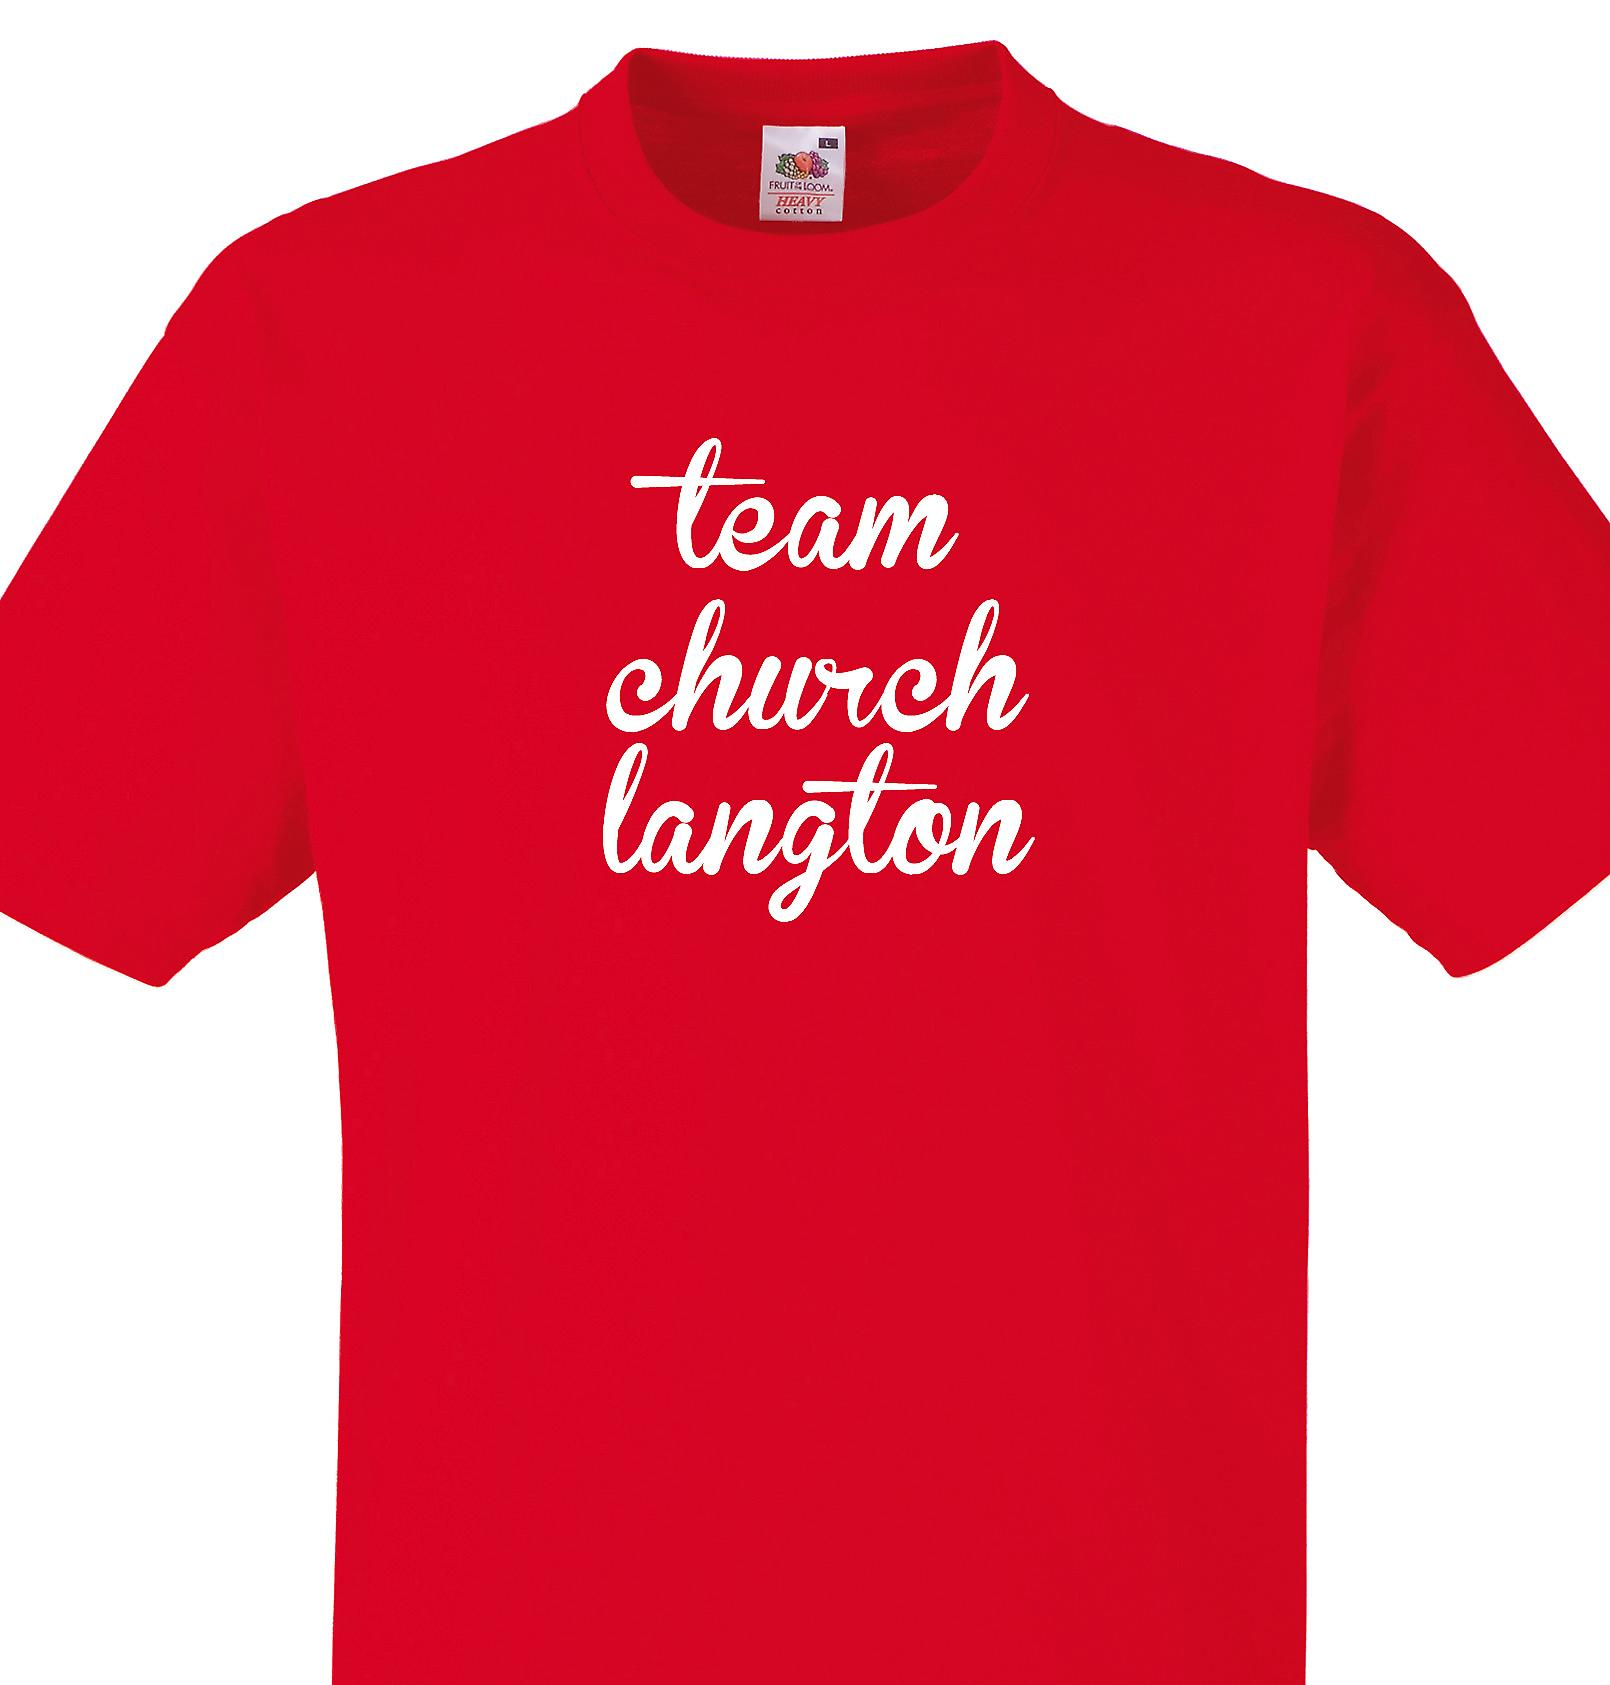 Team Church langton Red T shirt